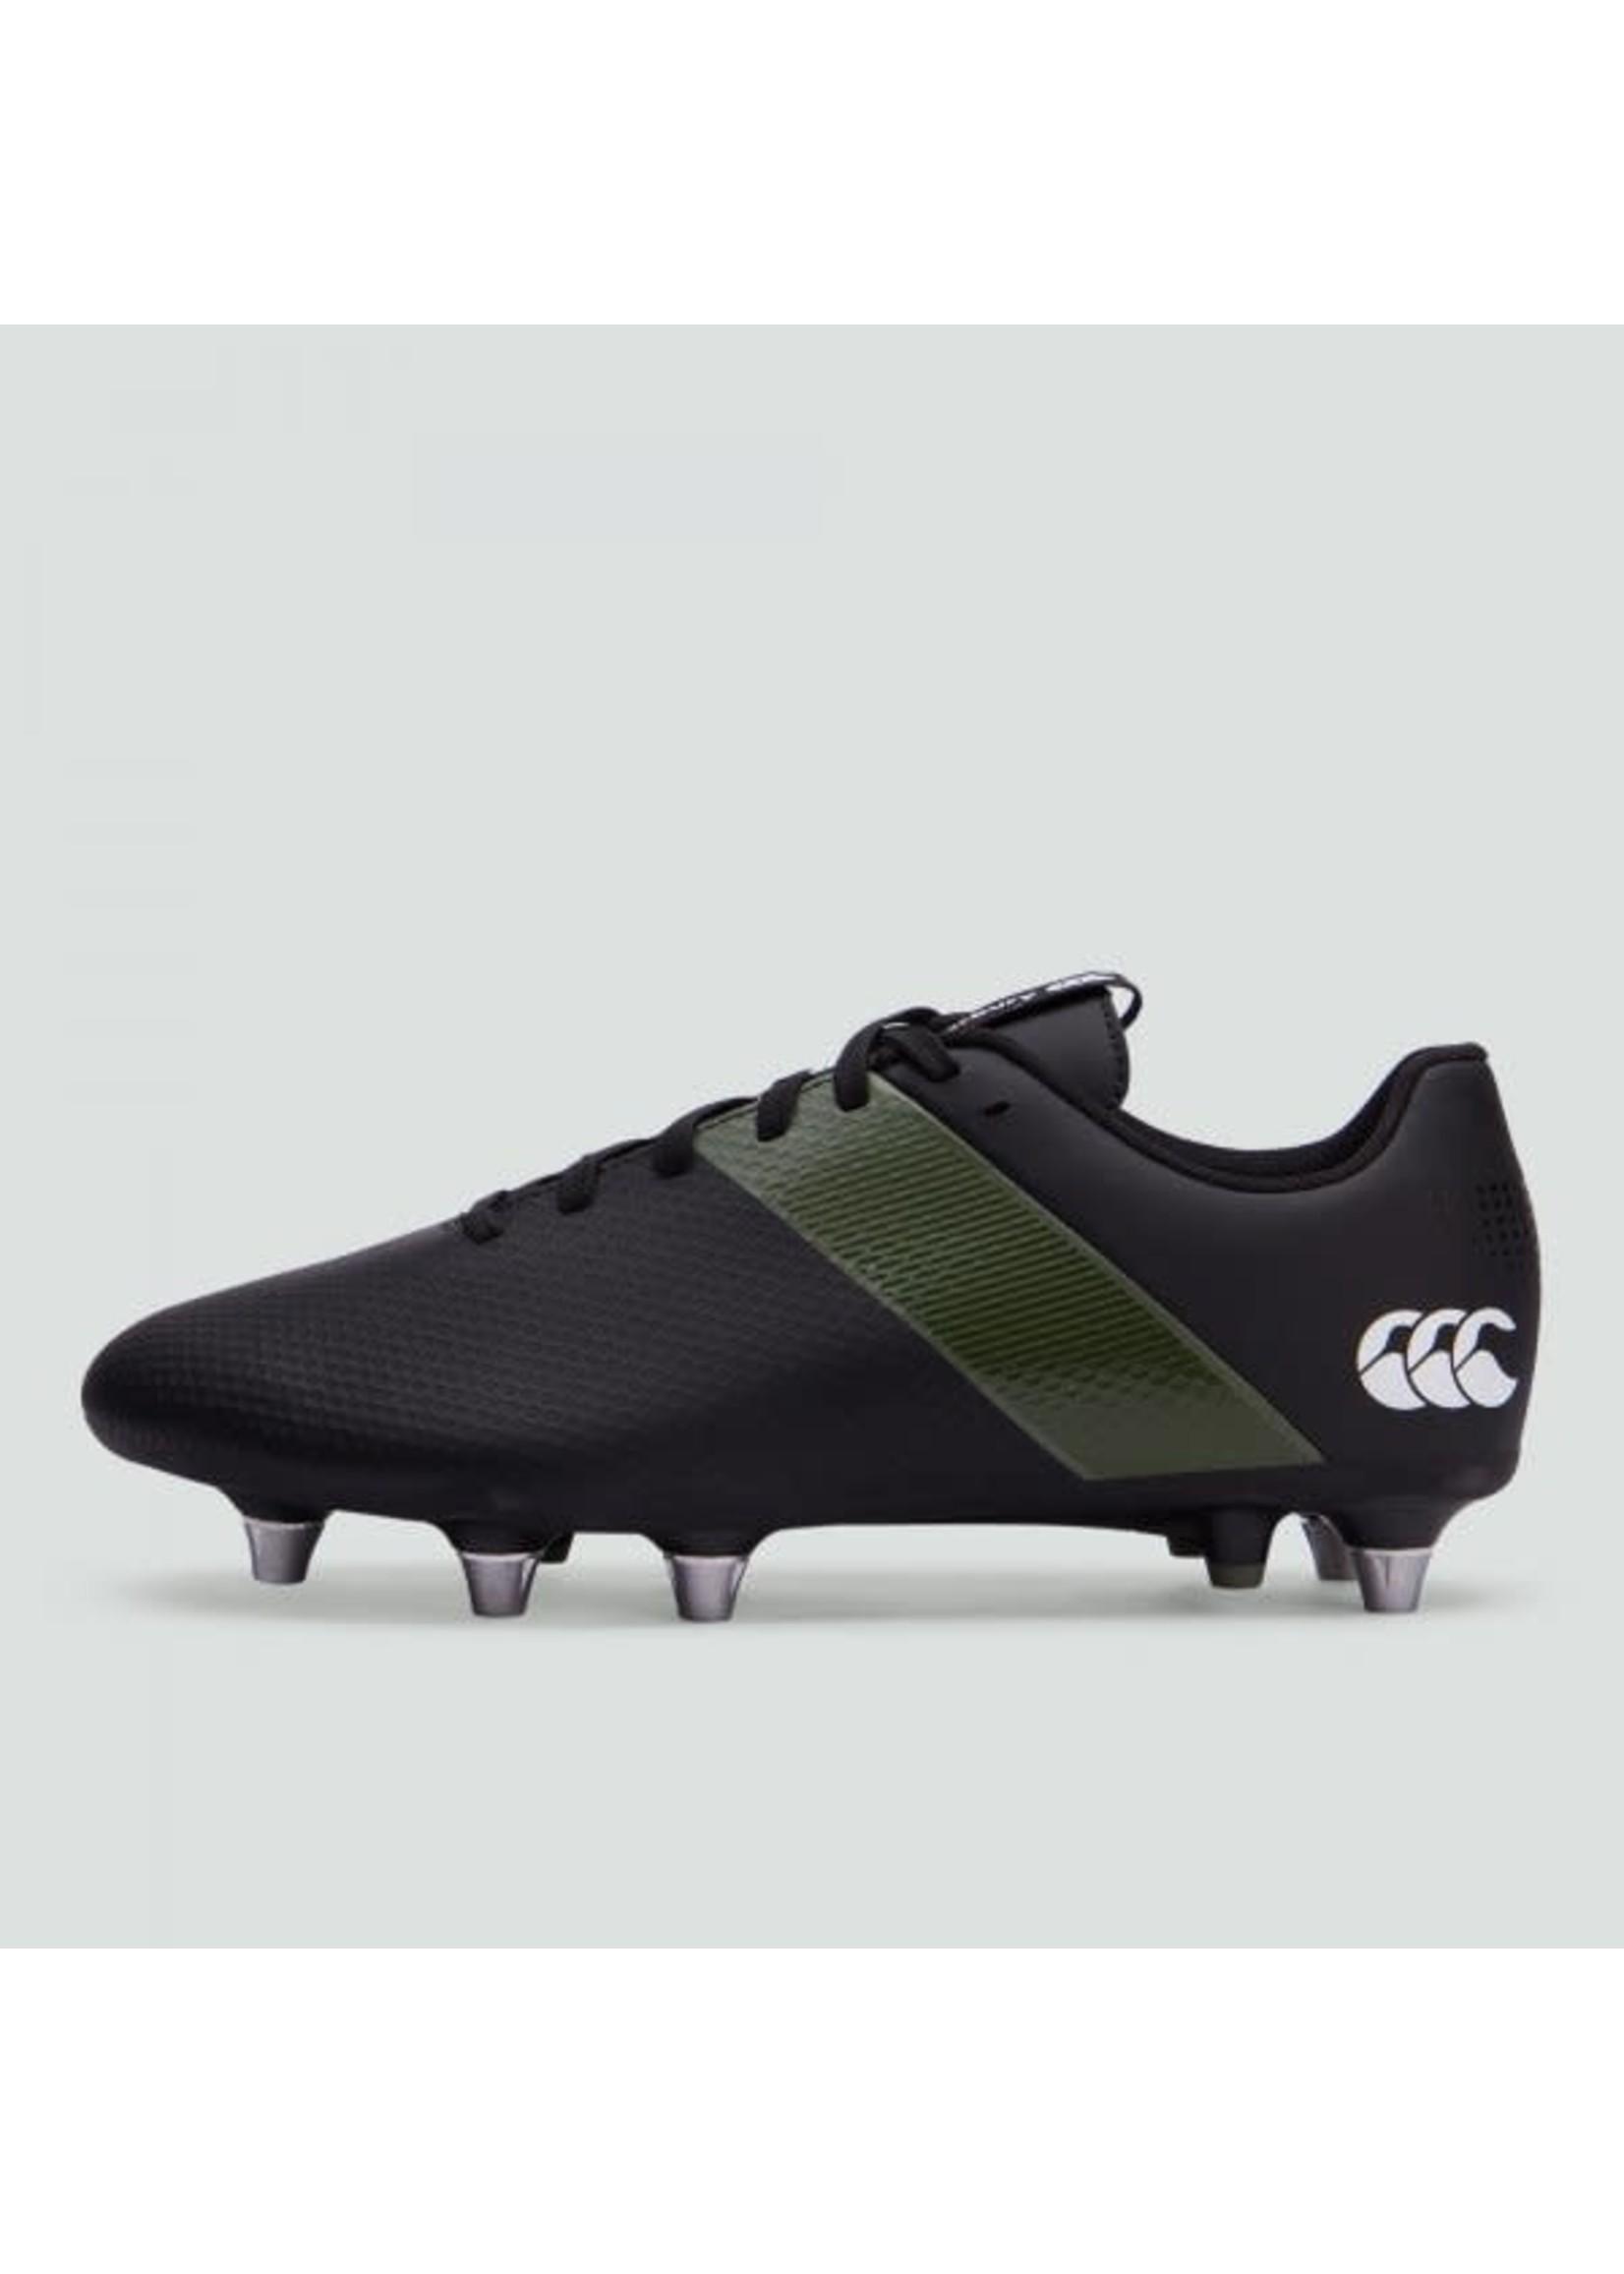 Canterbury Canterbury CCC Phoenix 3.0 SG Rugby Boot (2021) Black/Green